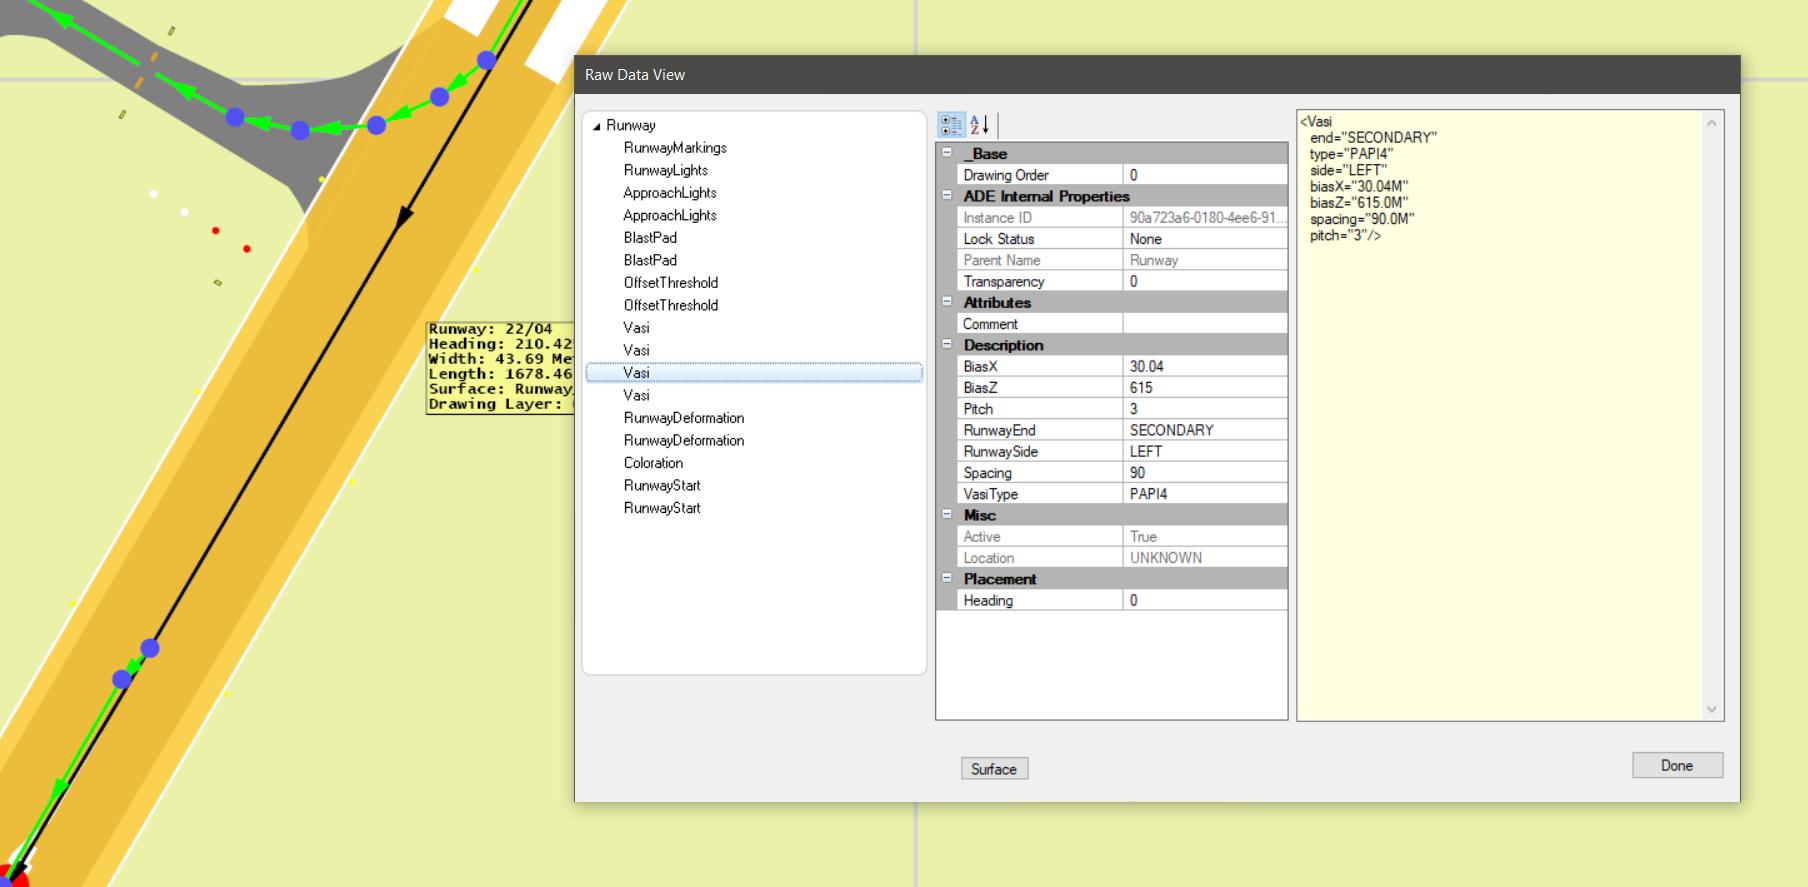 Screenshot 2021-05-09 104947.png